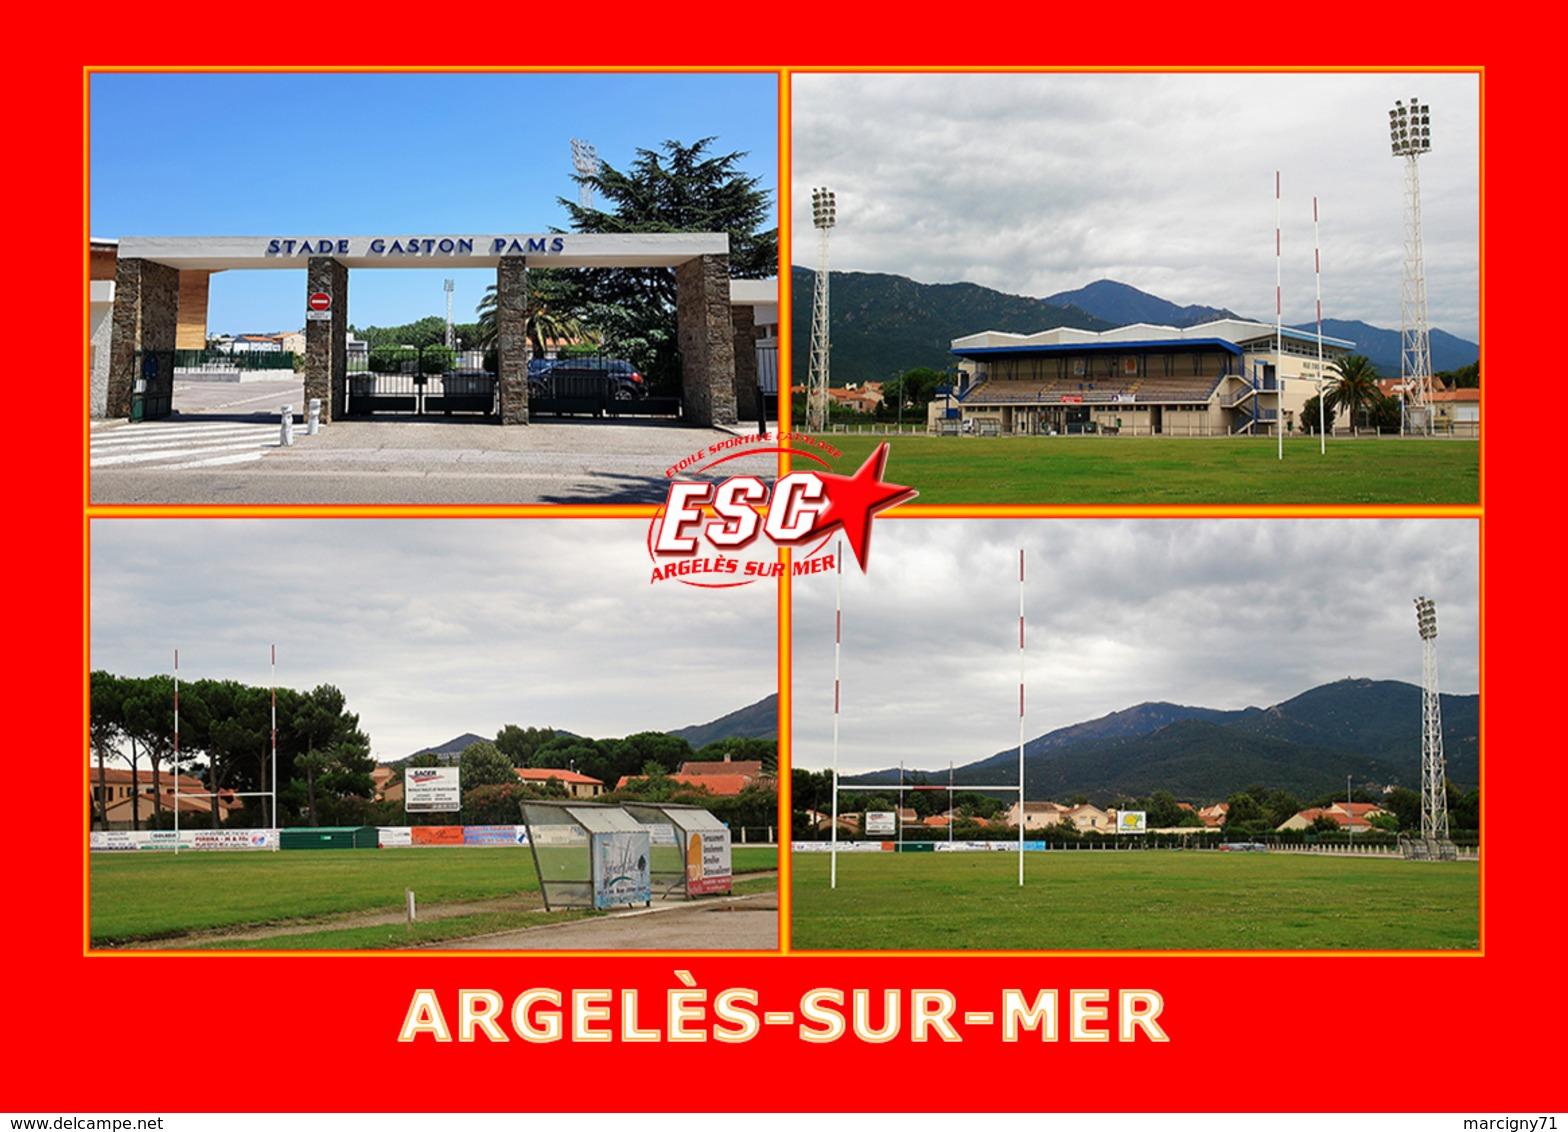 ARGELES SUR MER Stade Gaston Pams Stadium Estadio - Argeles Sur Mer